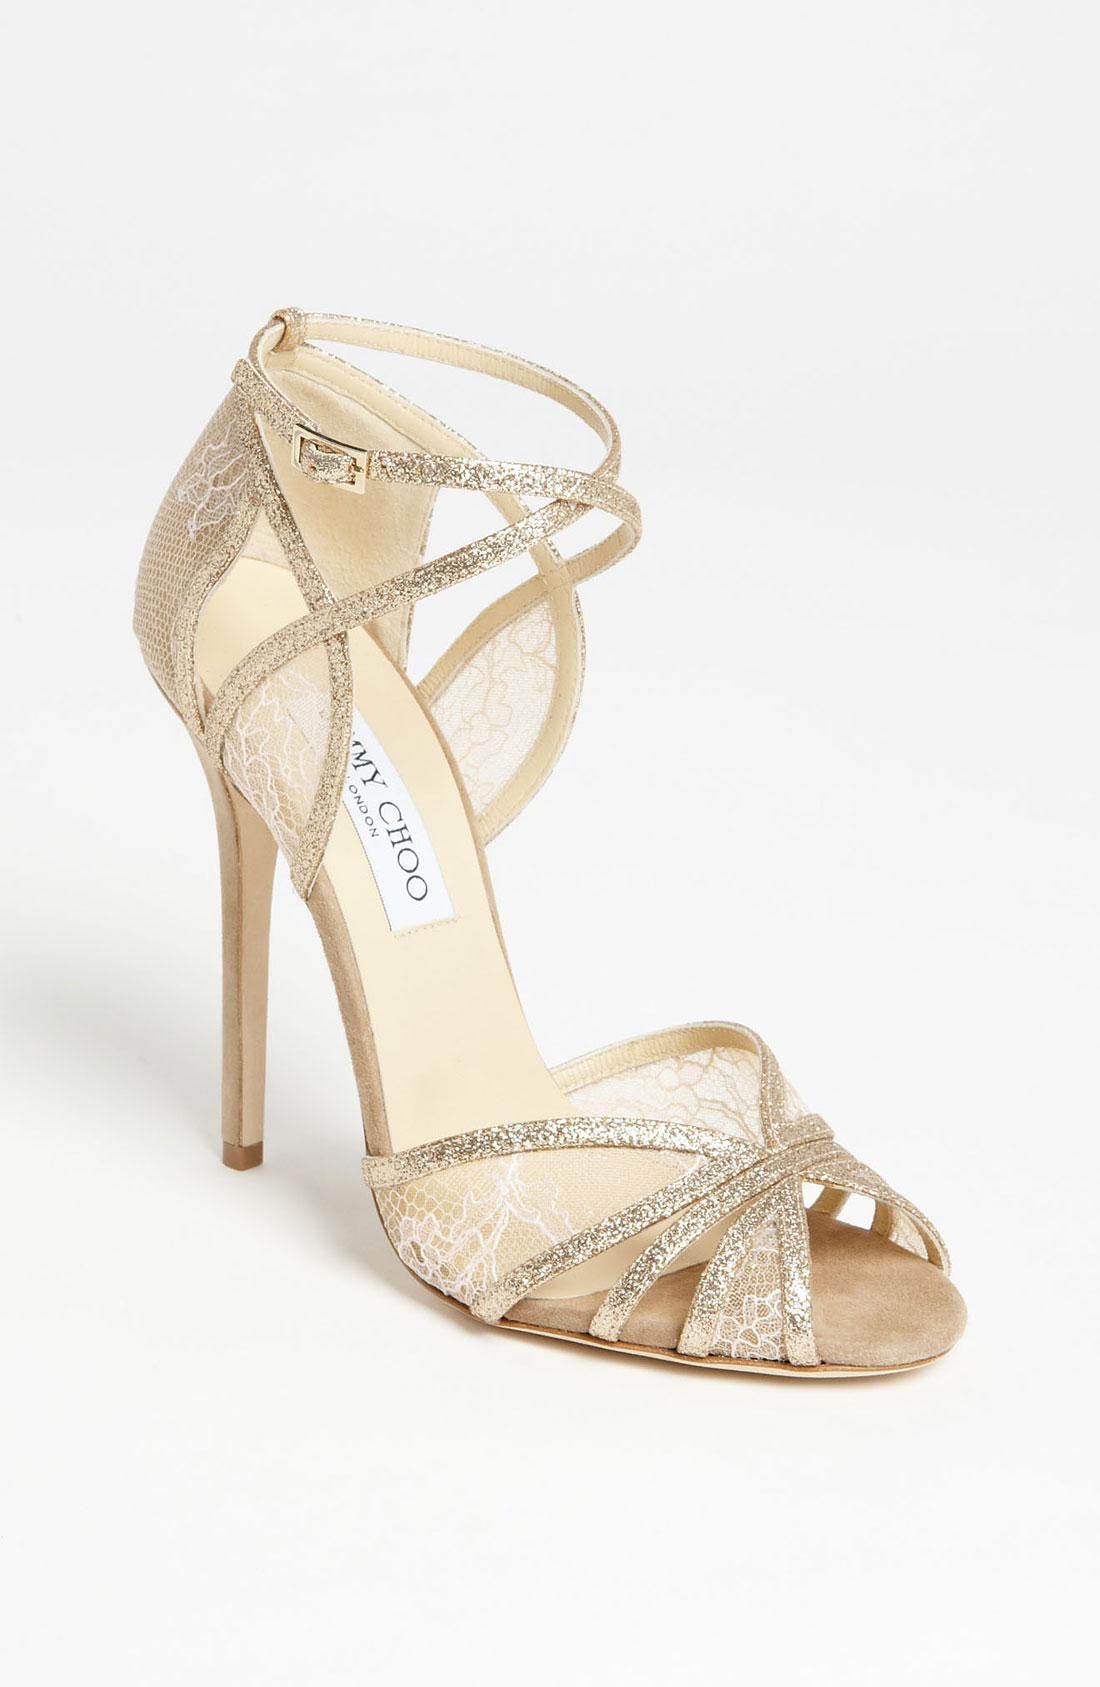 jimmy choo beige fitch sandals pre order jimmy choo wedding shoes Jimmy Choo beige Fitch sandals pre order